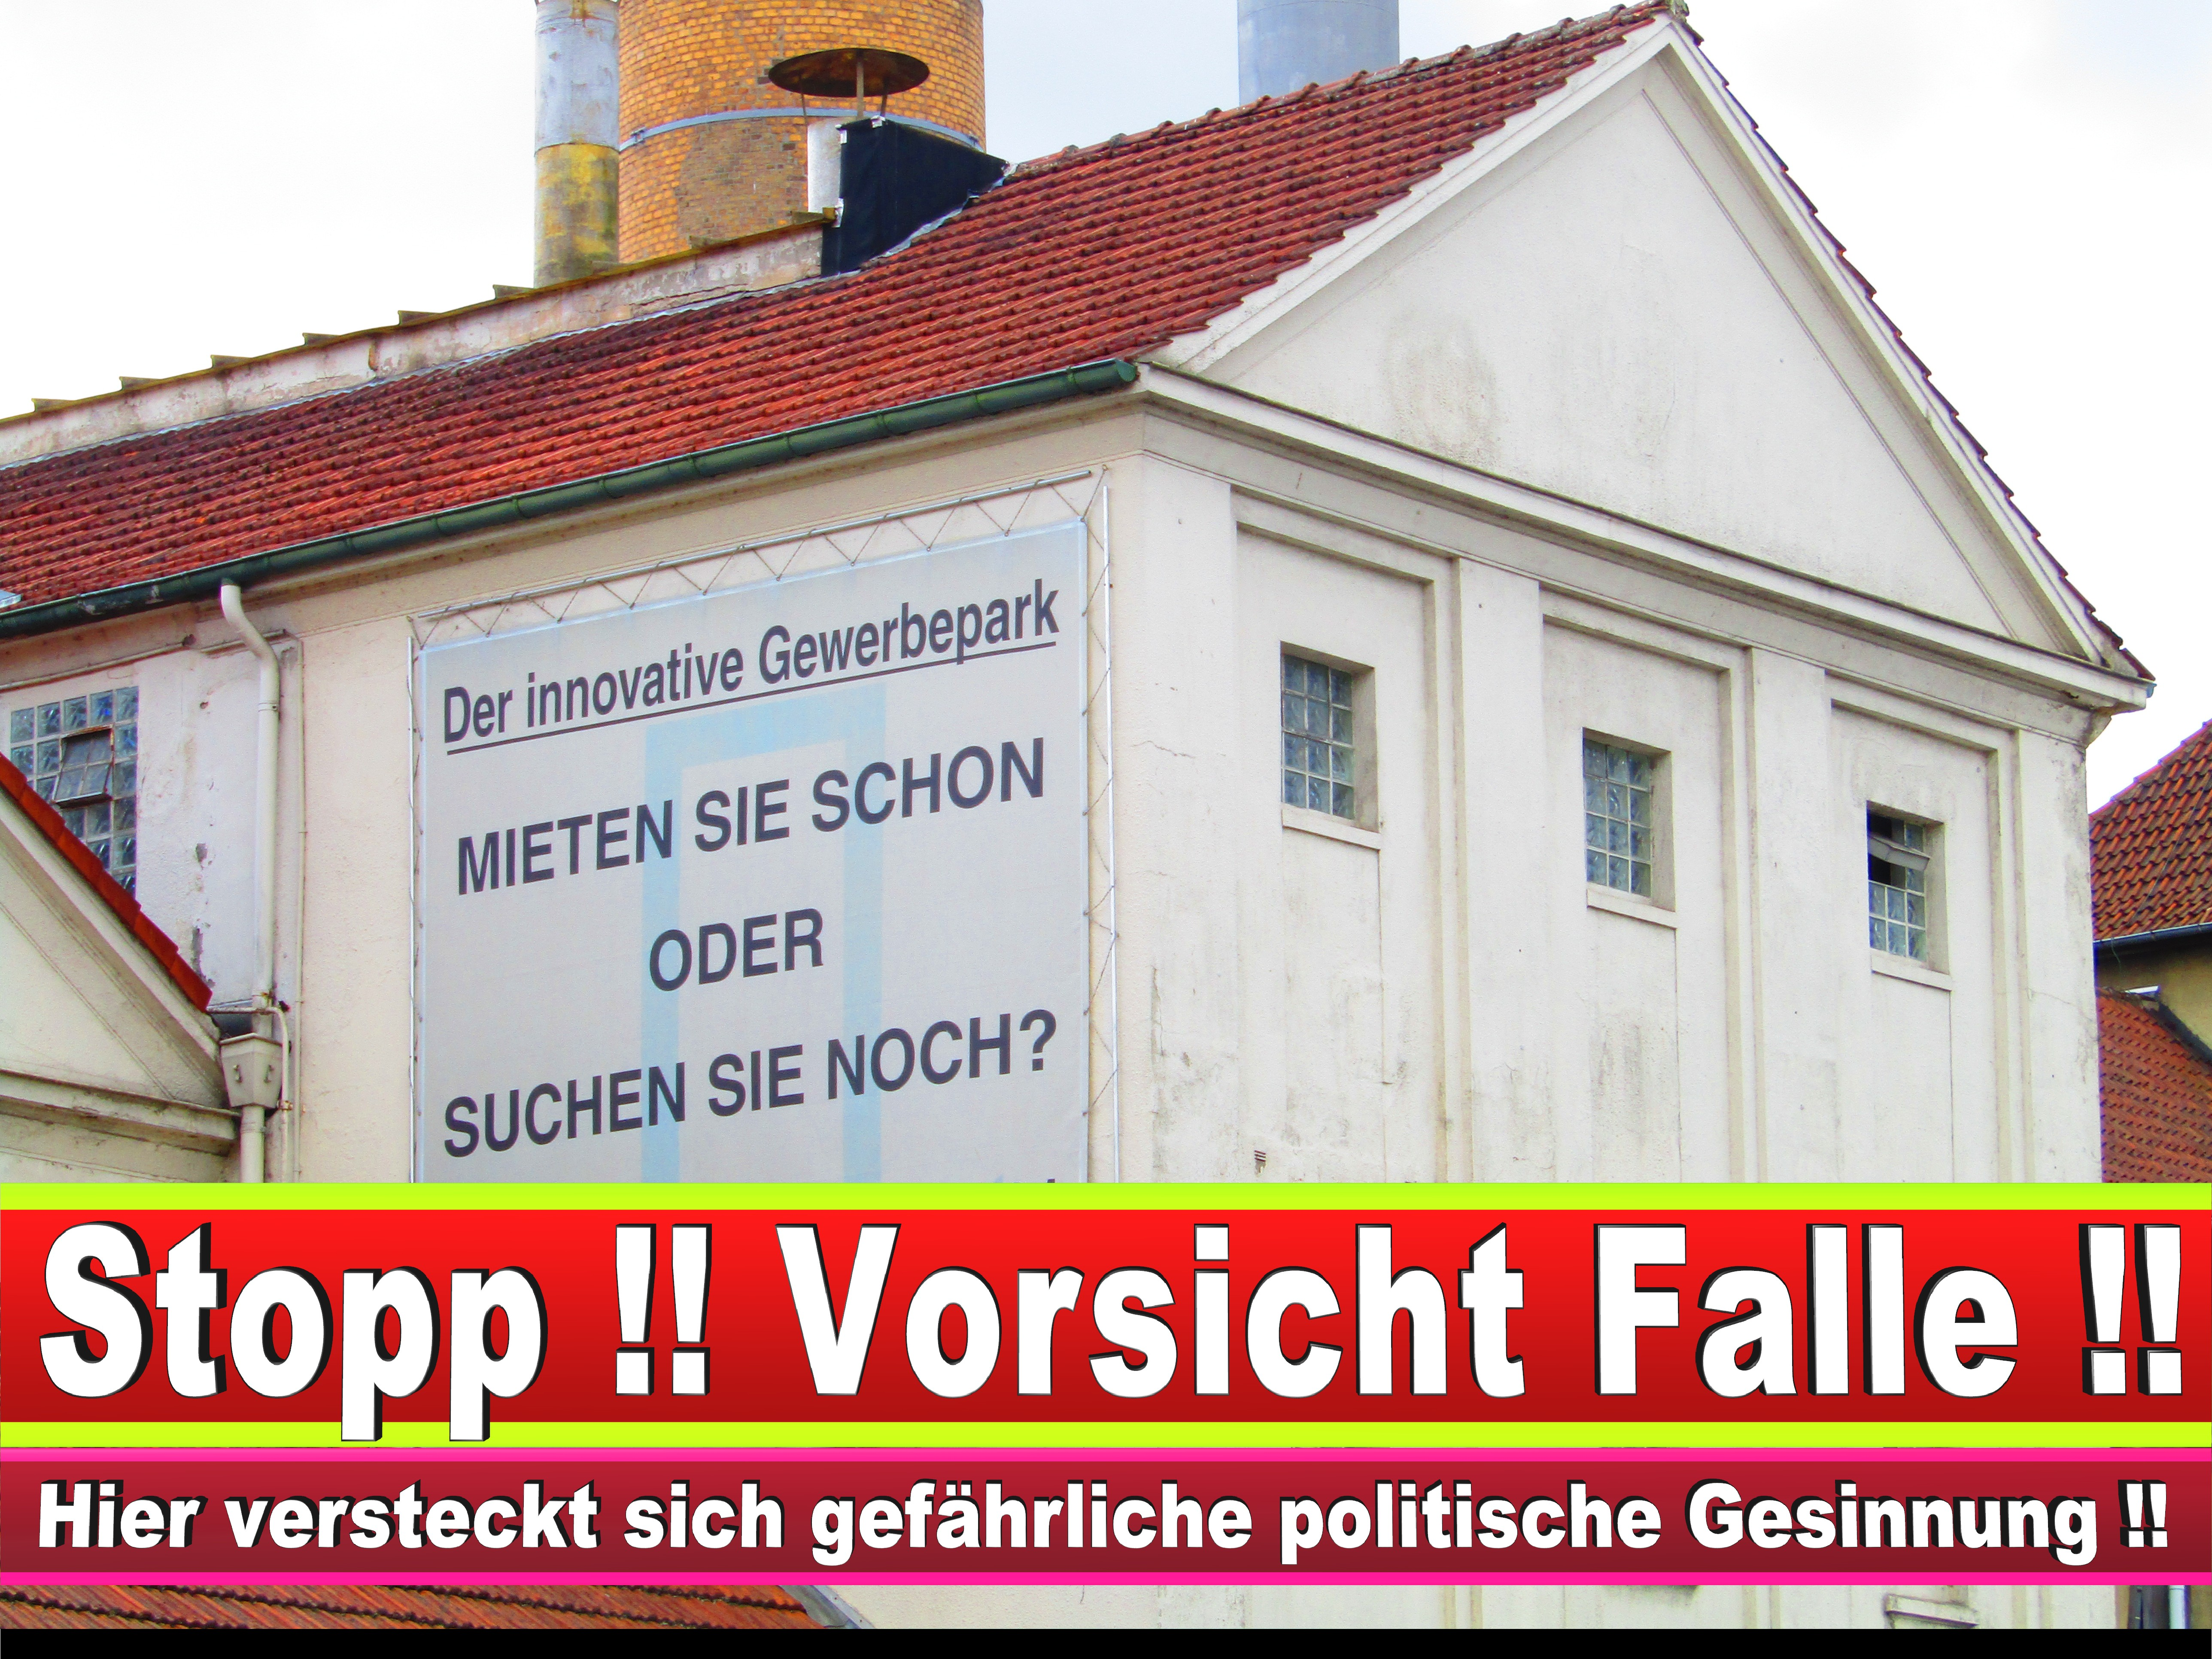 RE PET KUNSTSTOFFRECYCLING GMBH Christoph Wybranietz Wilhelmsdorfer Str 3 Bielefeld